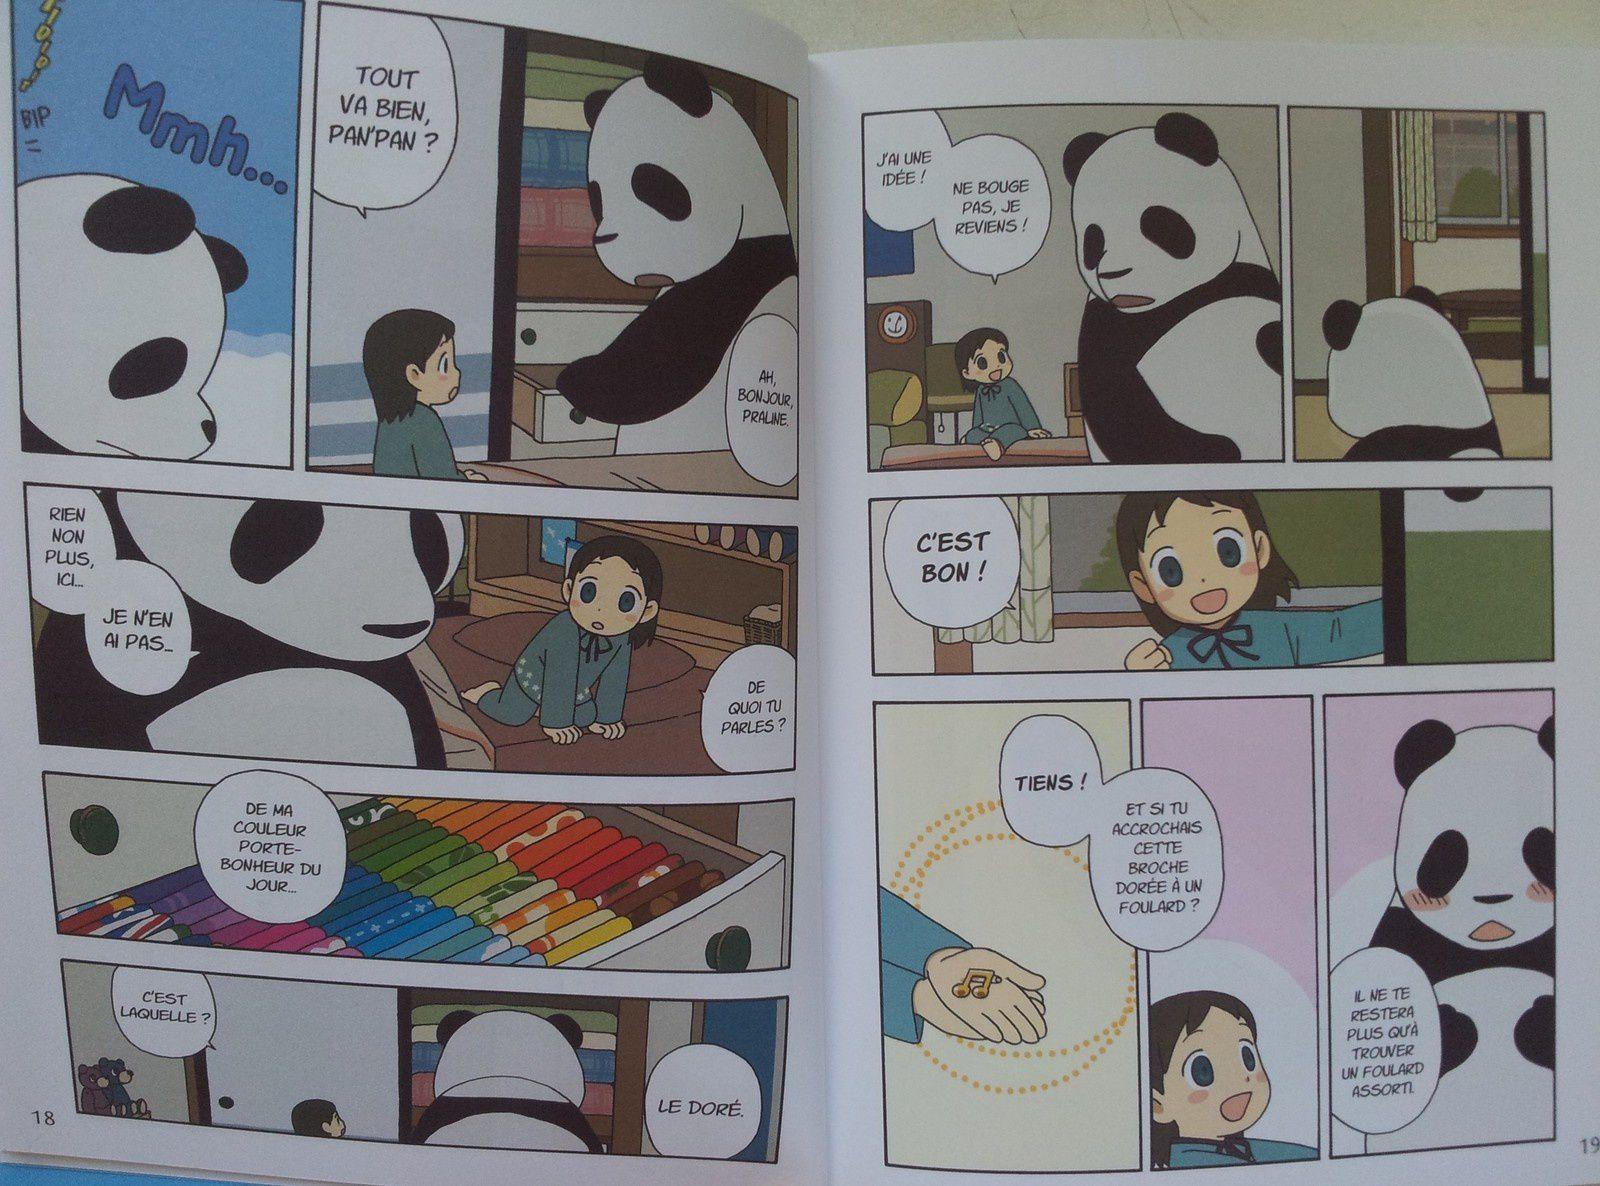 Pan'Pan Panda. 1 Une vie en douceur. Sato HOROKURA. (Dès 8 ans)